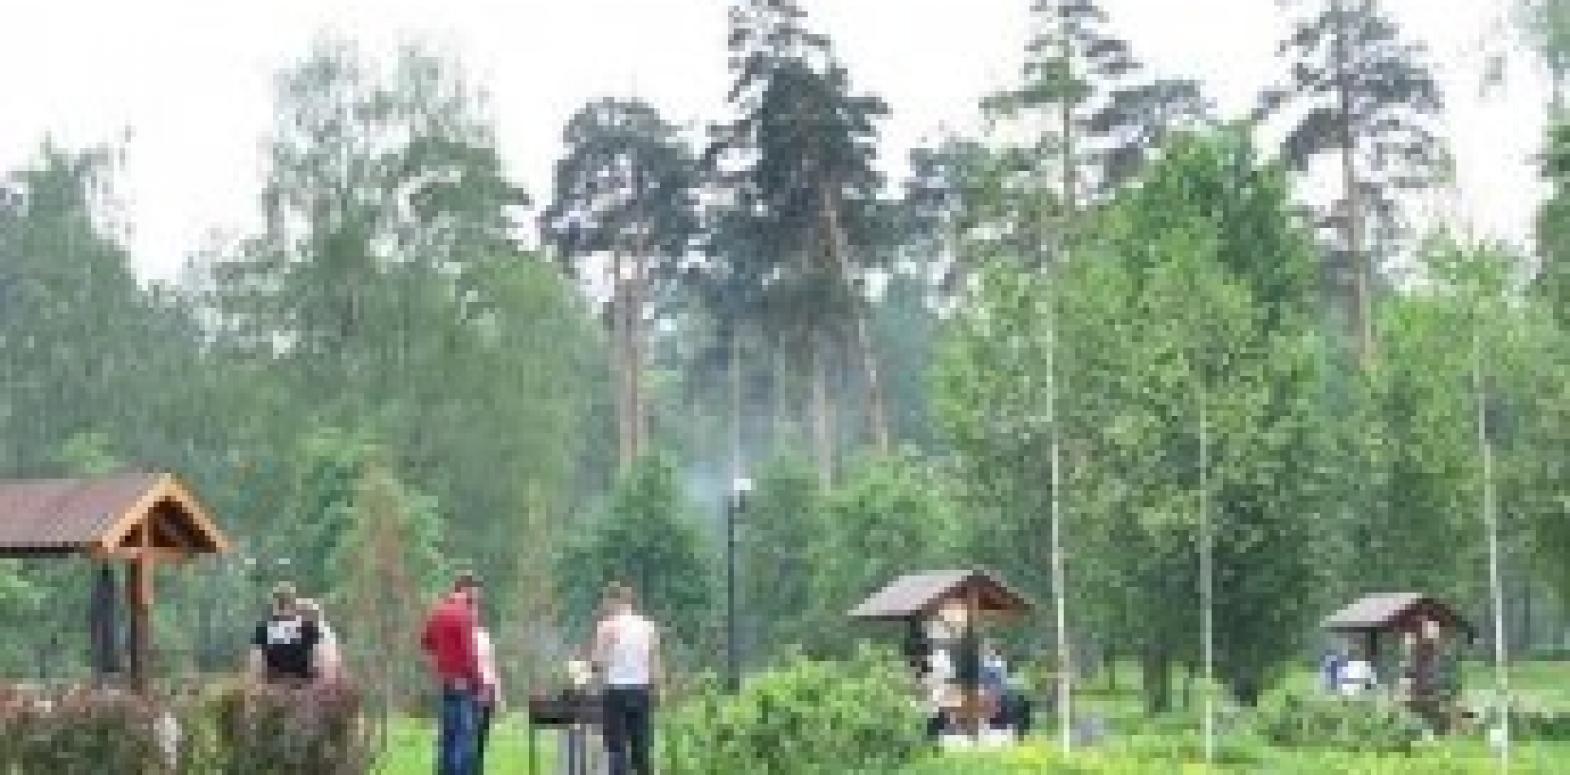 Штраф за шашлыки во время карантина  в Киеве составит от 17 до 34 тыс. грн